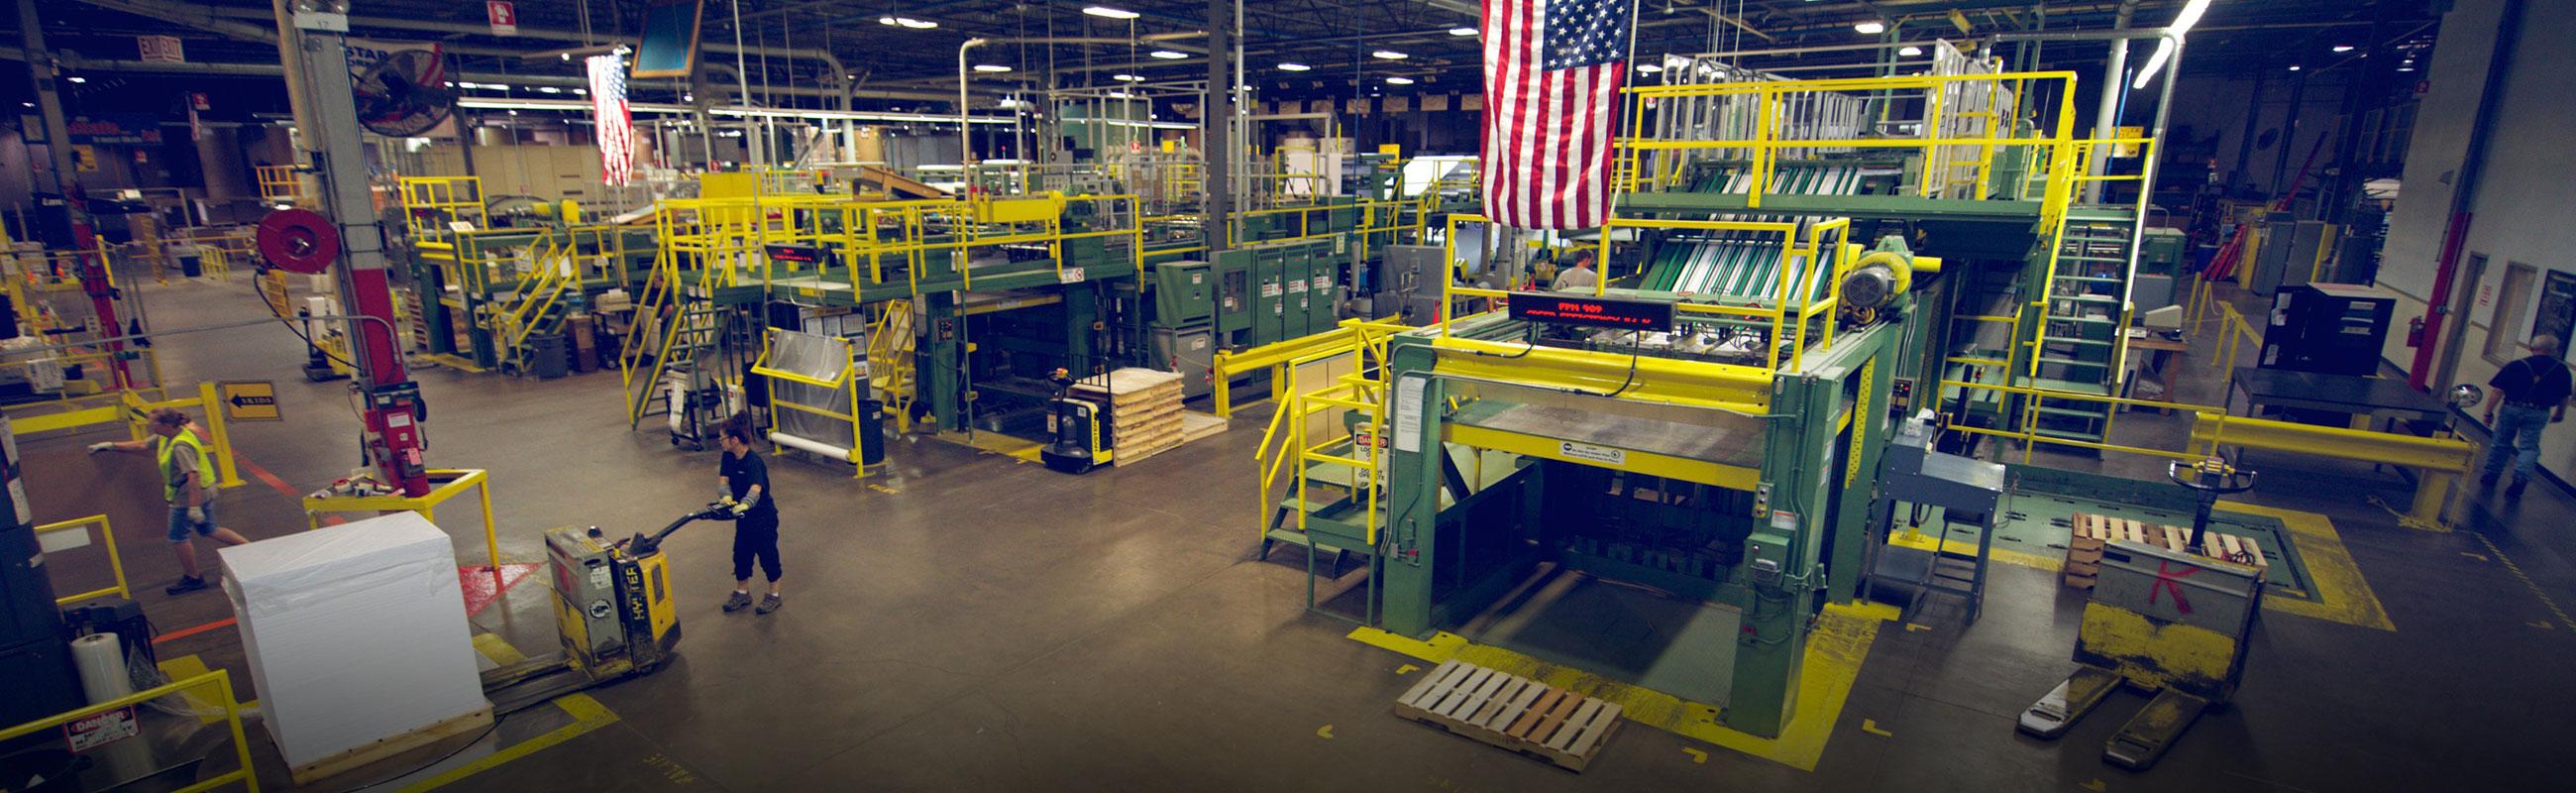 Commercial converting sbs sheeting atlantic